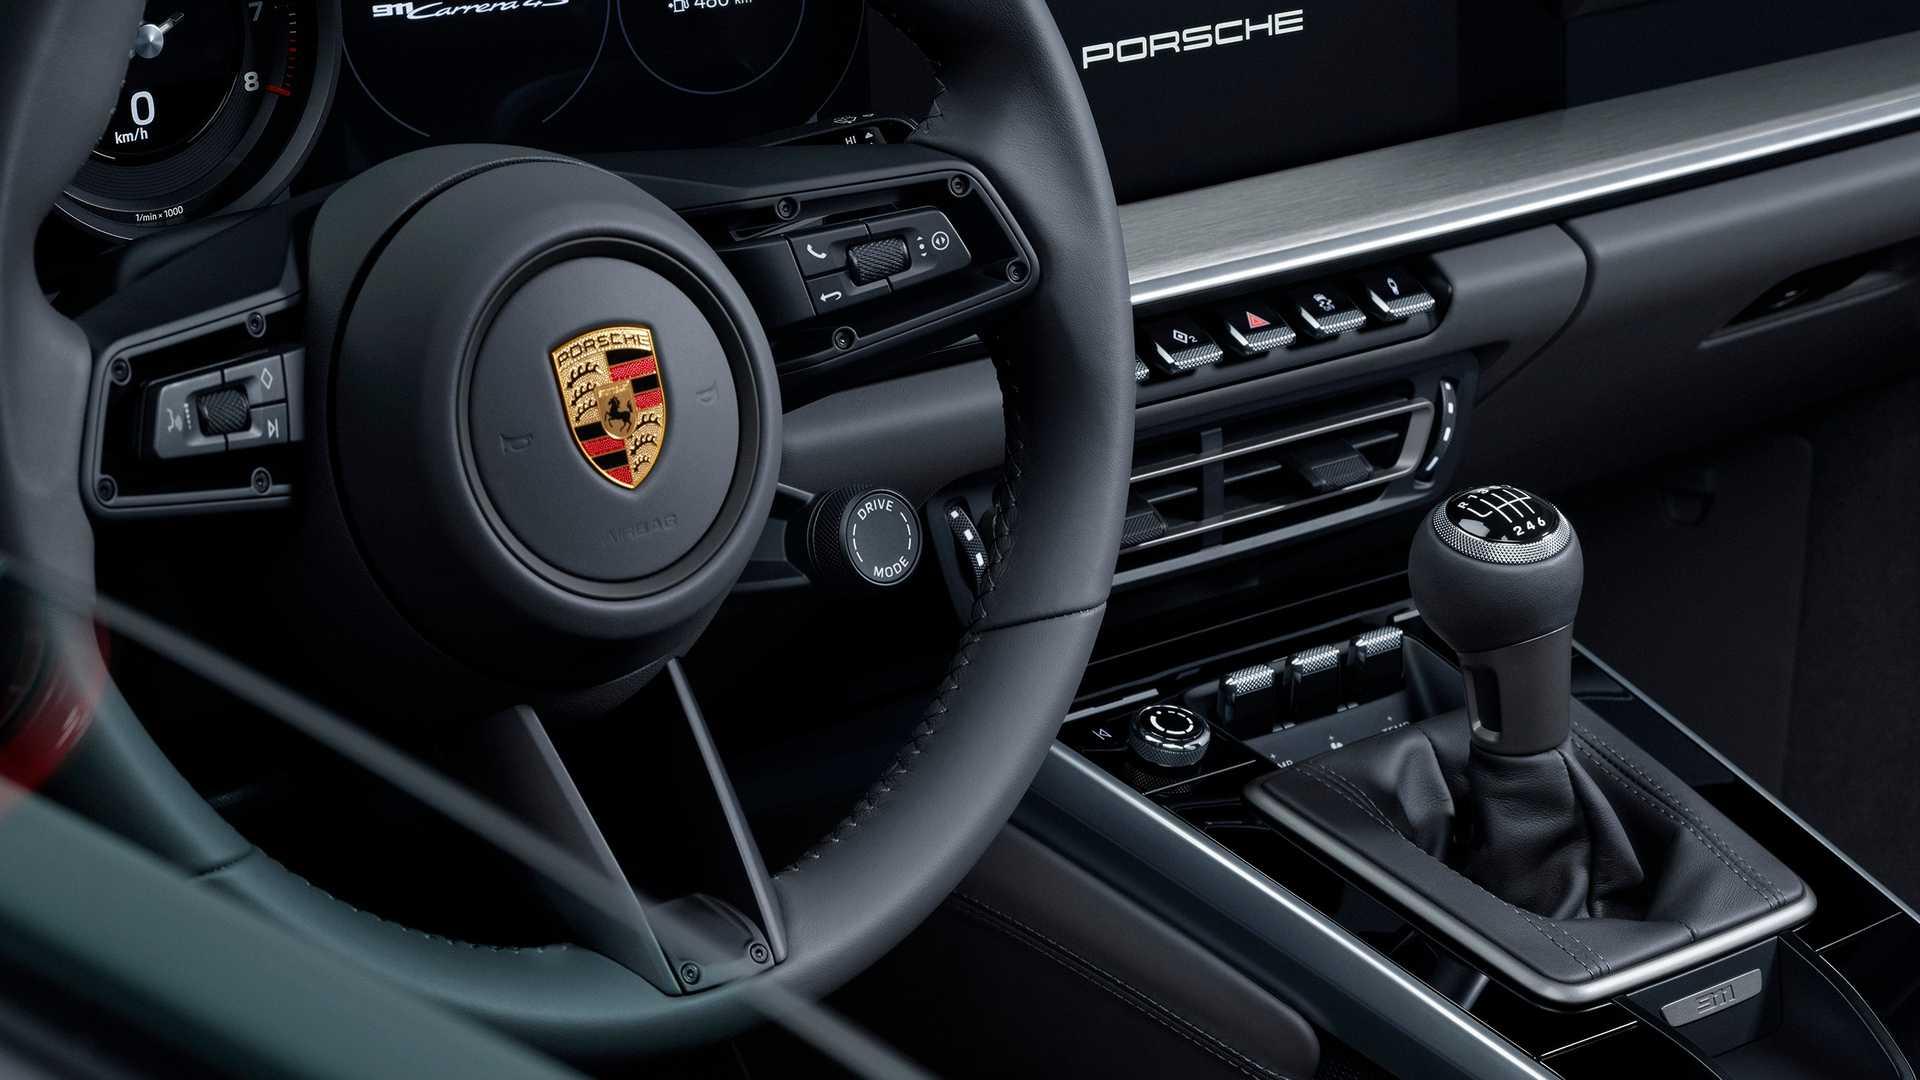 2020-porsche-911-carrera-s-4s-manual-transmission.jpg